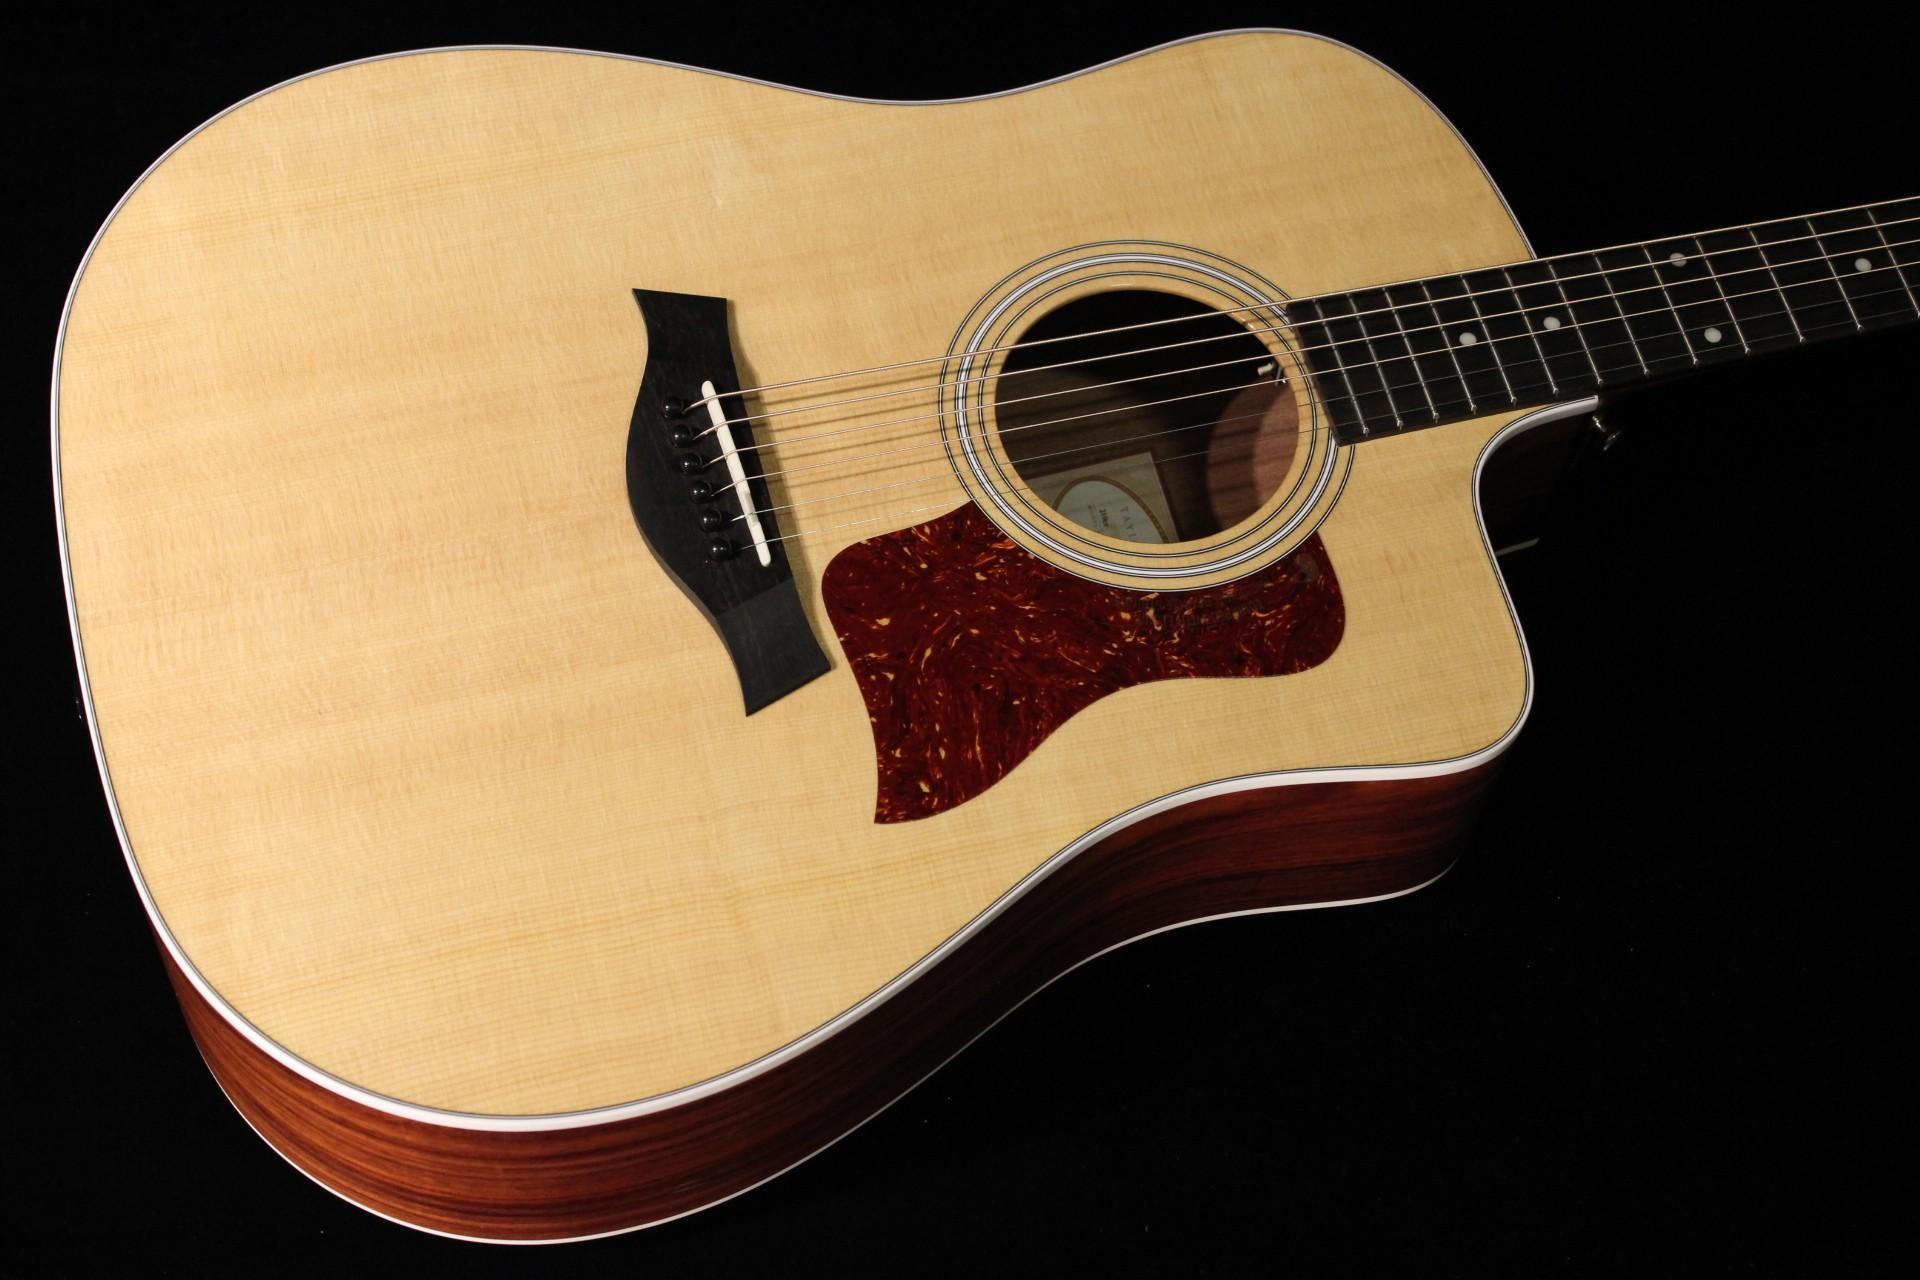 Taylor 210ce Natural (SN: 2105124133) | Gino Guitars